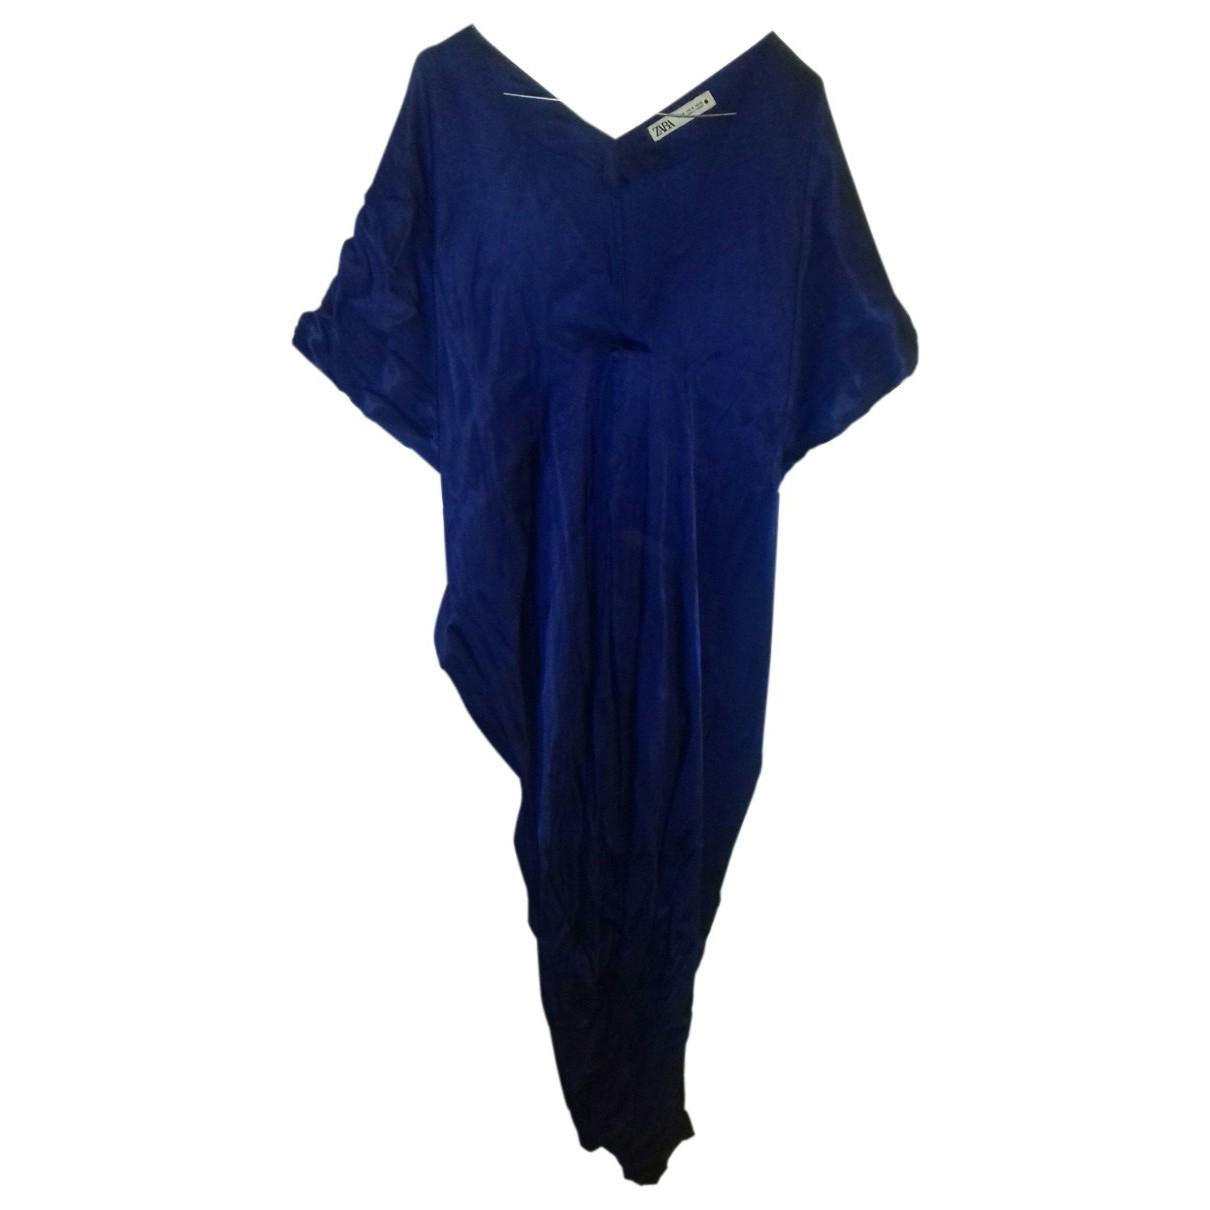 Zara N Blue dress for Women M International